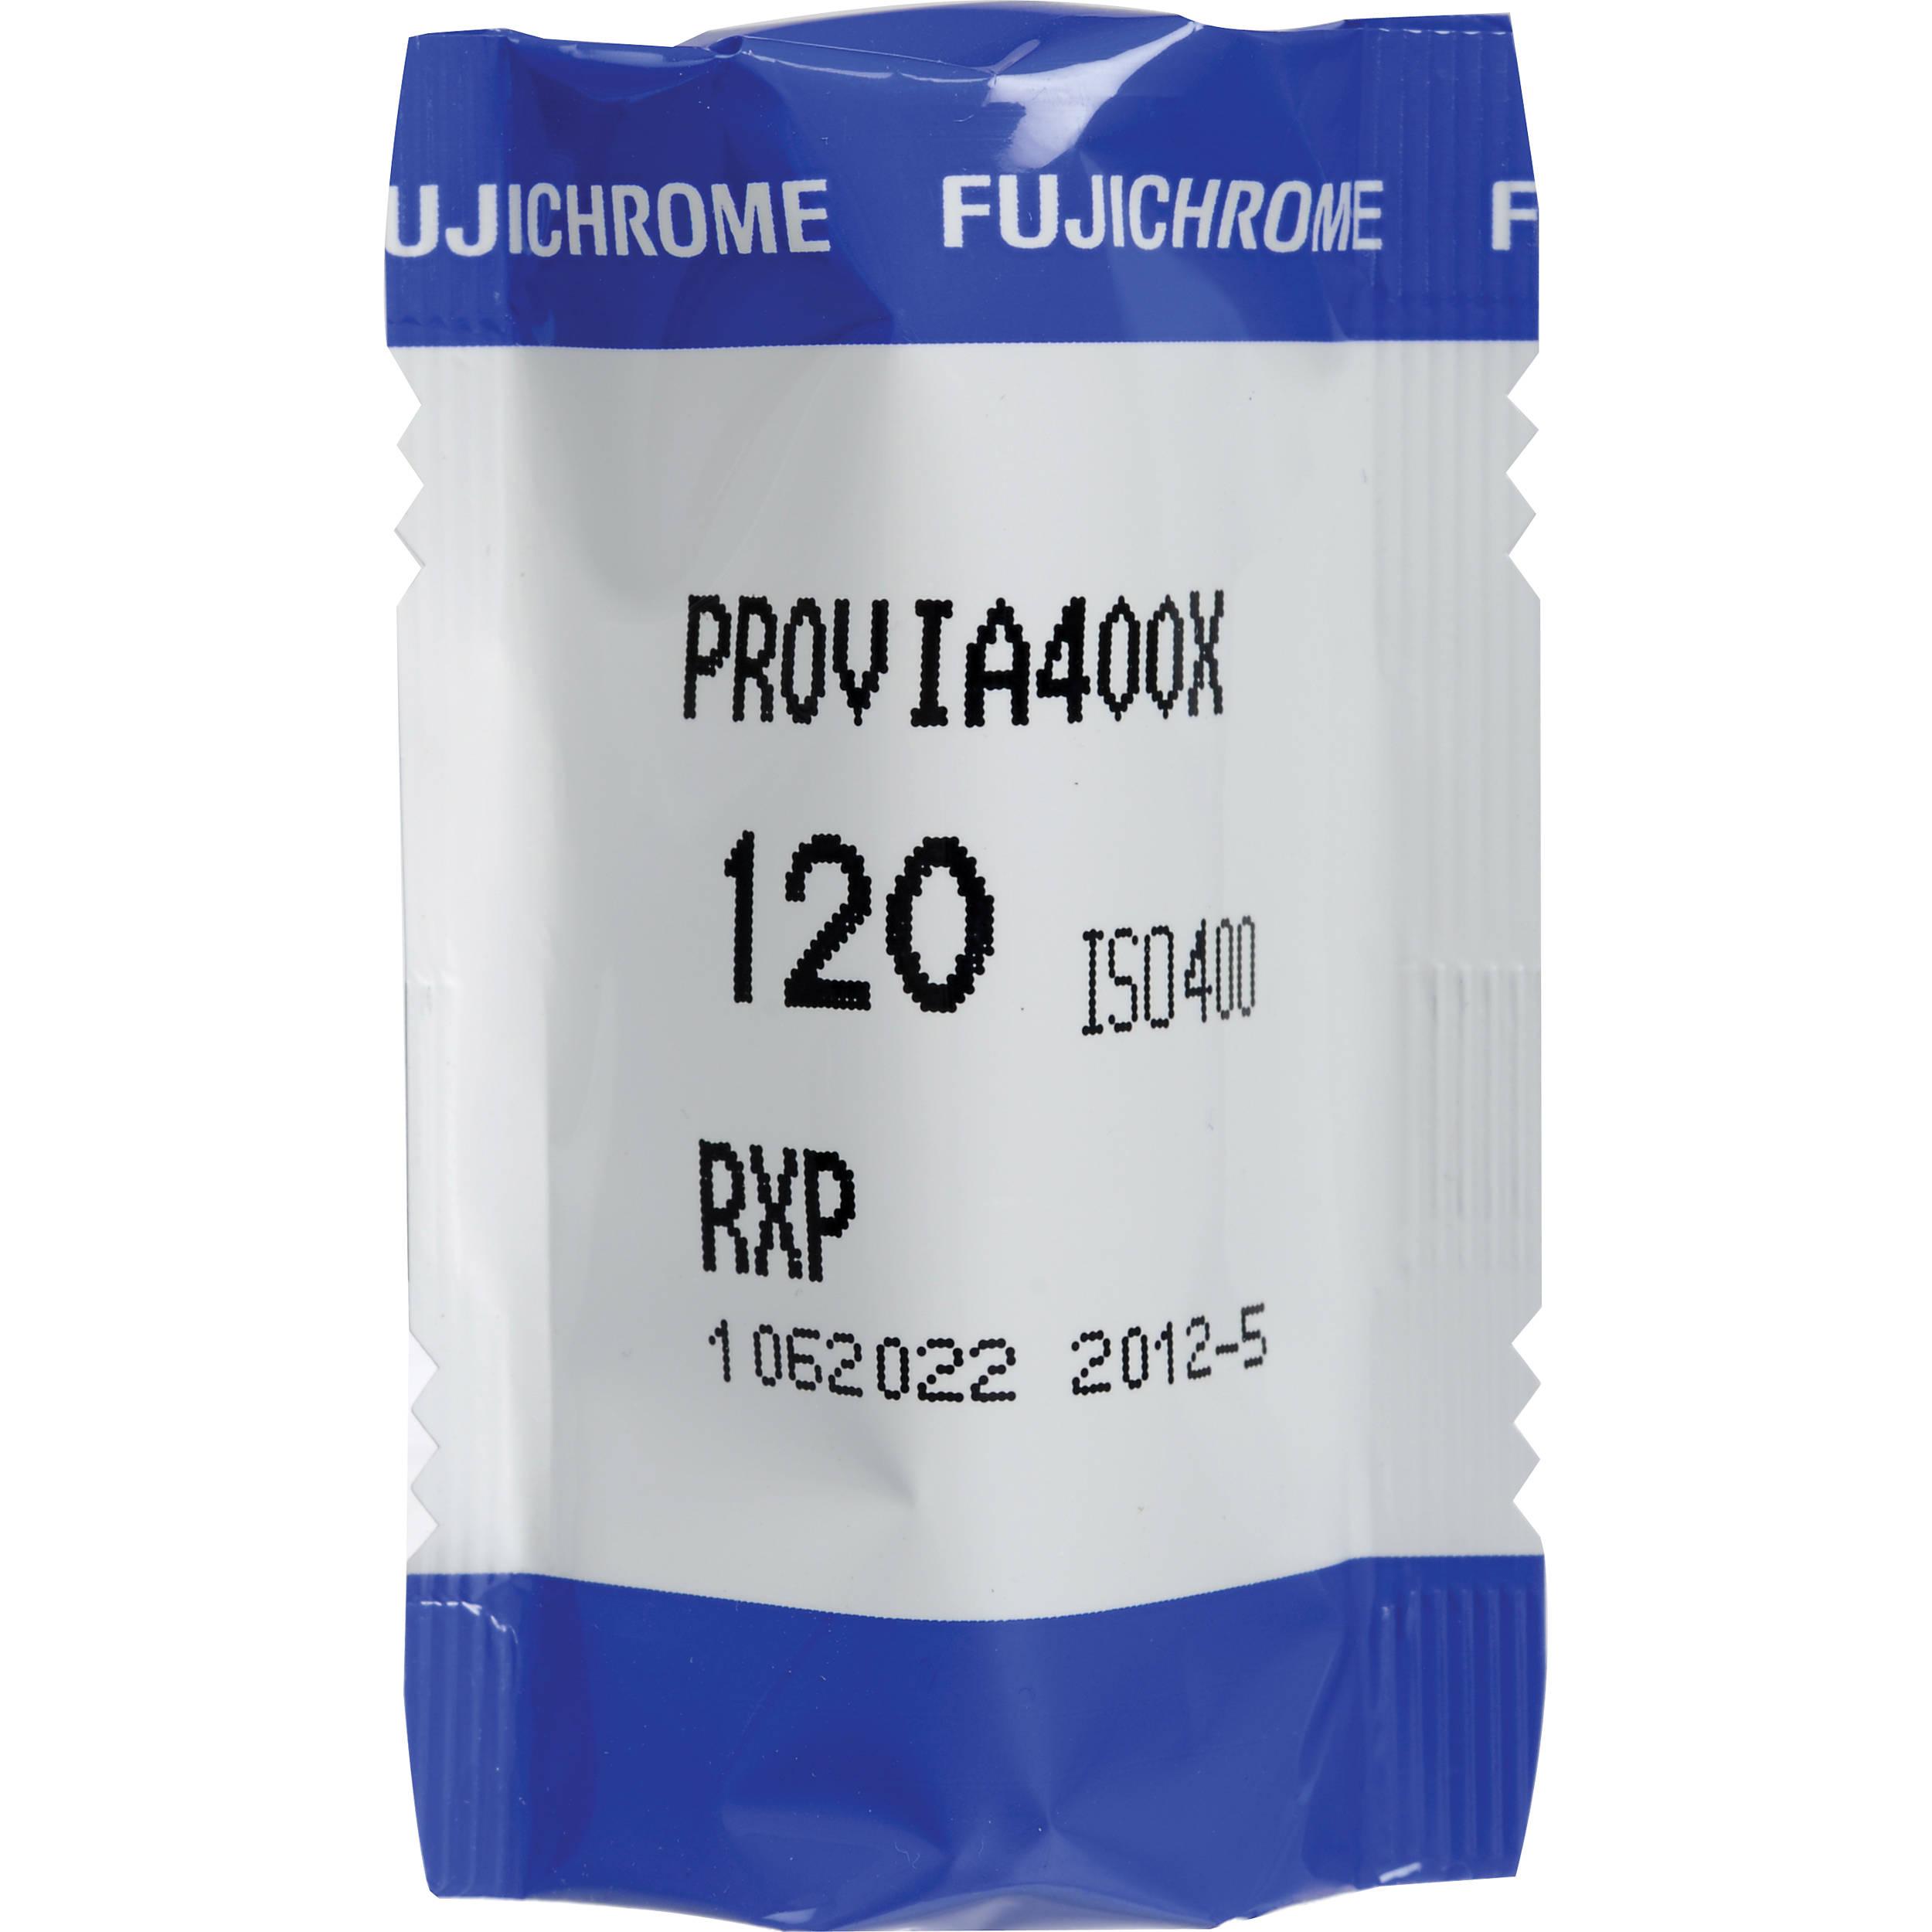 Fujifilm fujichrome provia 400x rxp iii 120 color for What is provia